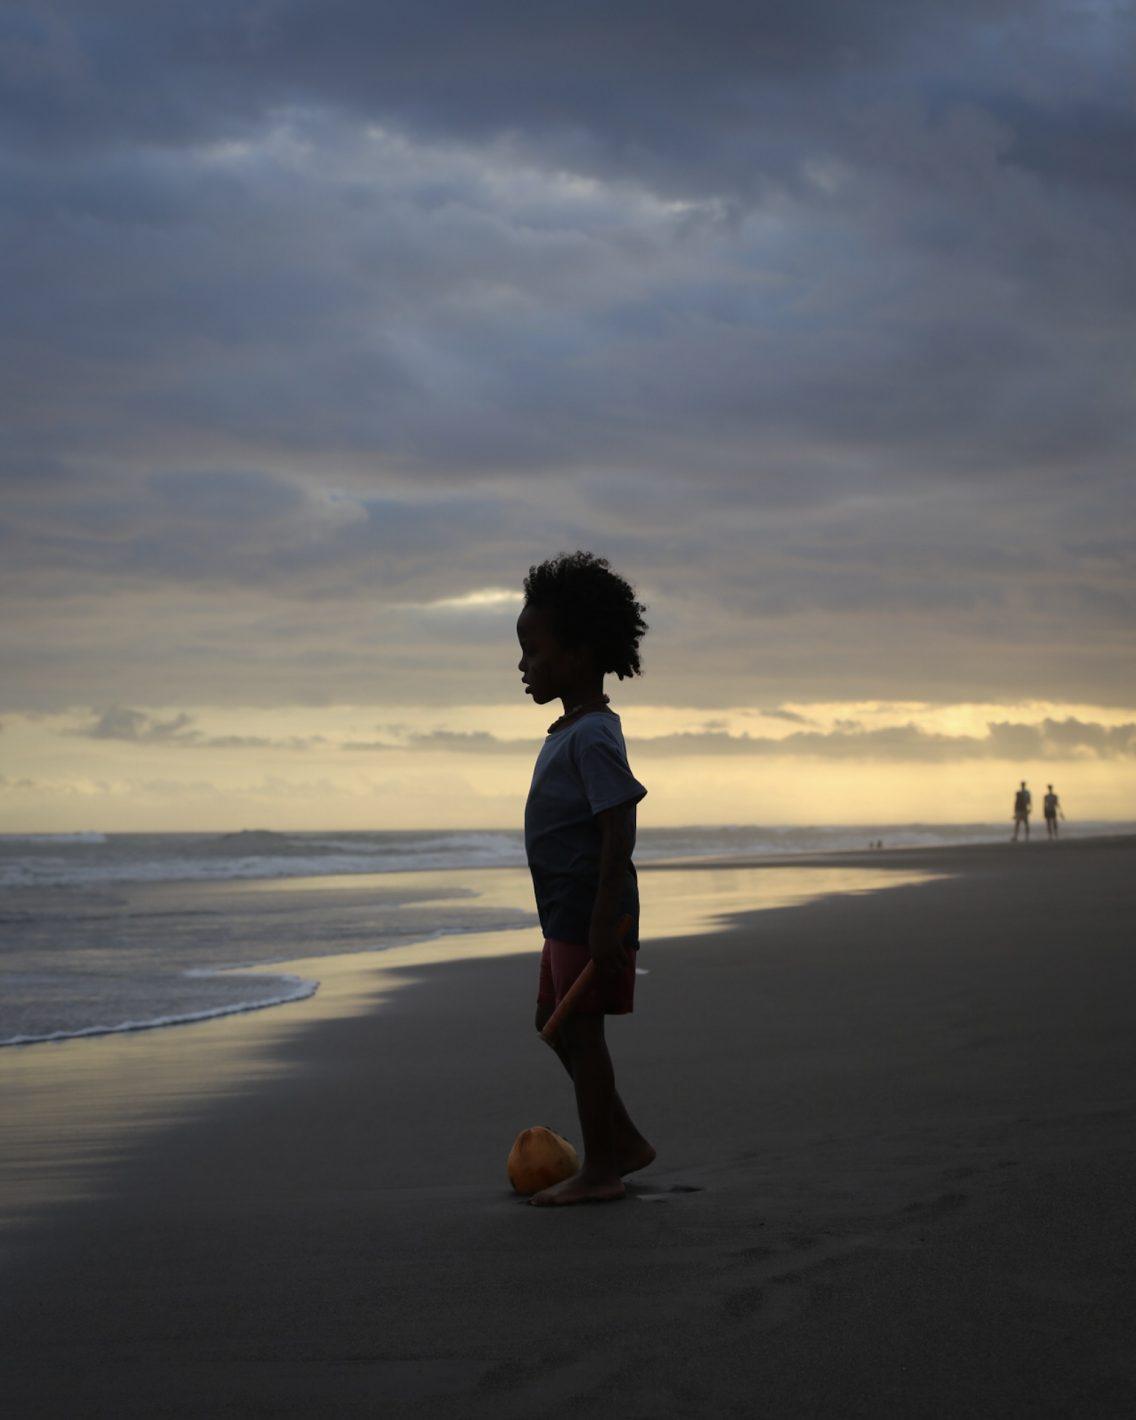 Enjoying sunset at Batu Bolong beach